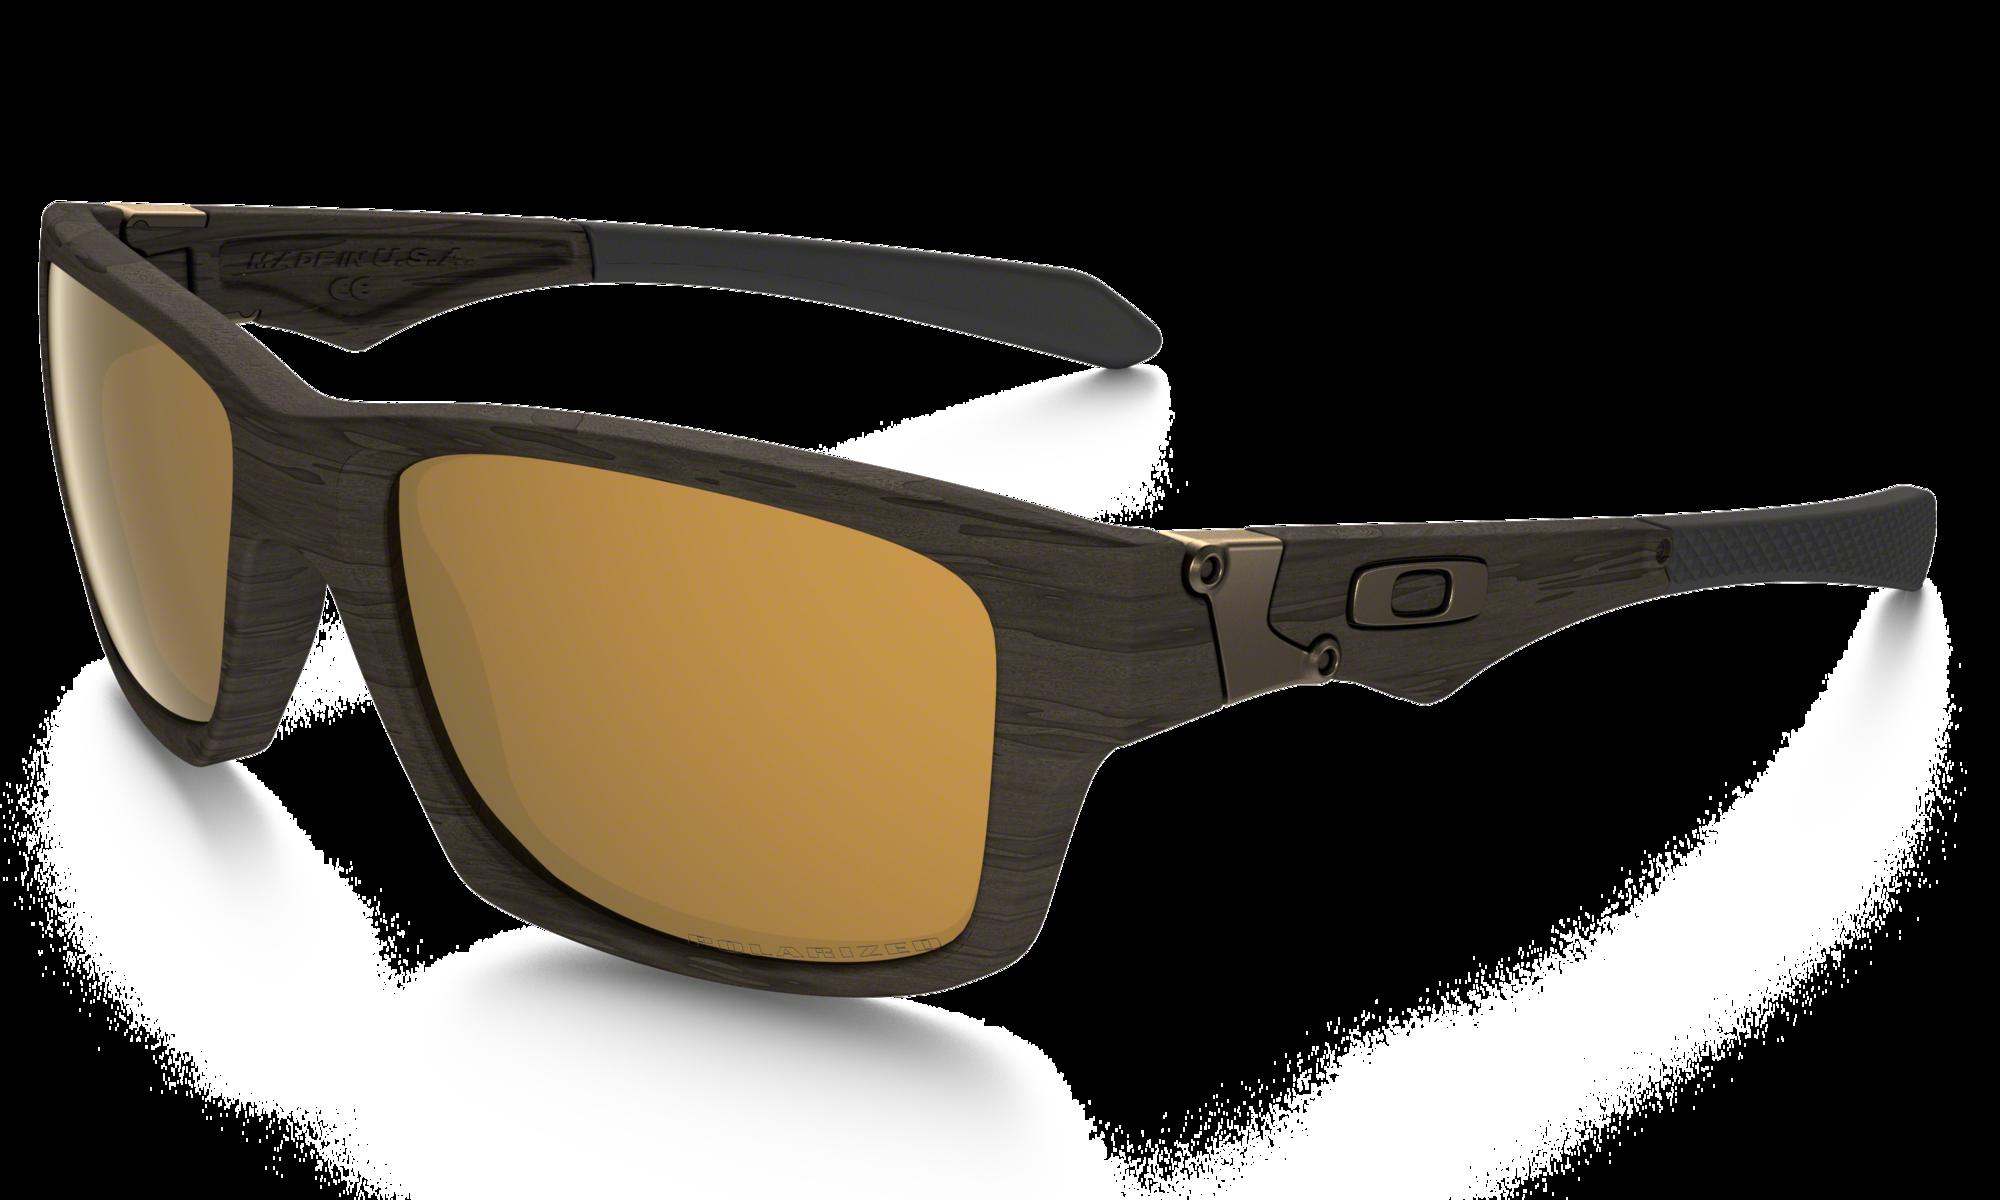 Oakley Gauge 8 >> Oakley Jupiter Squared - Woodgrain / Tungsten Iridium ...